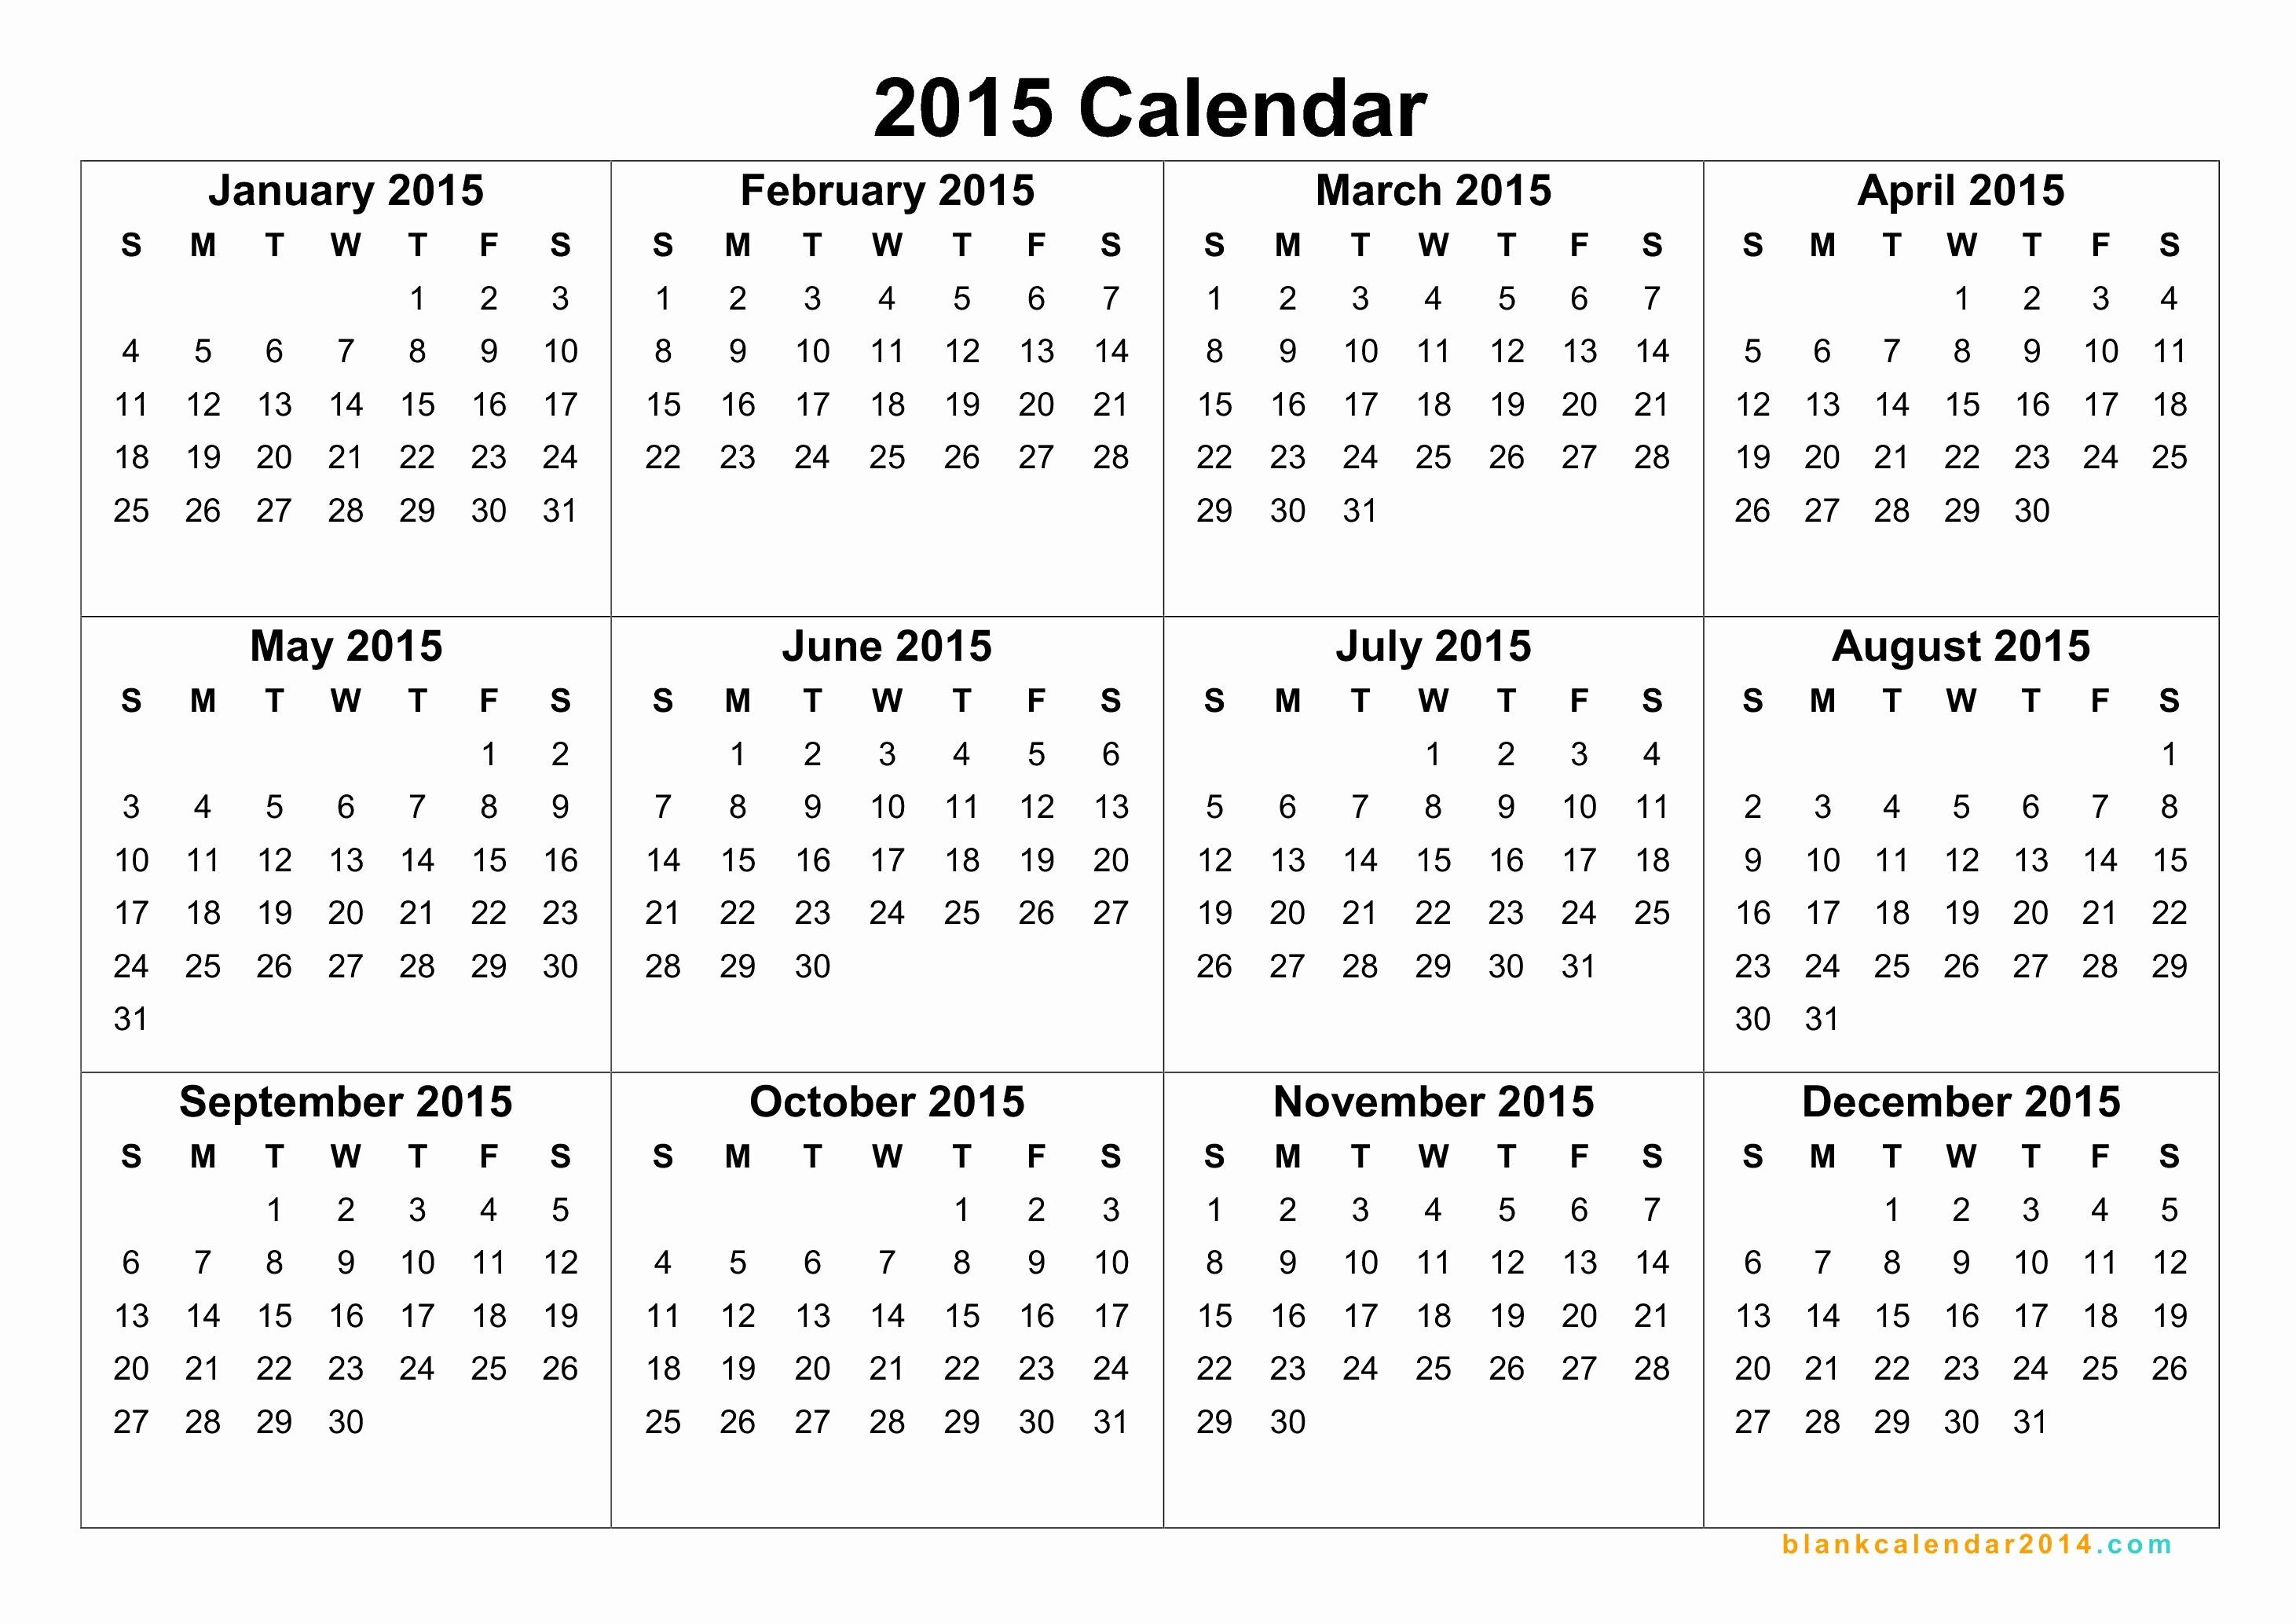 Free Calendar Templates August 2015 Luxury 2015 Calendar Free Yearly Calendar Templates